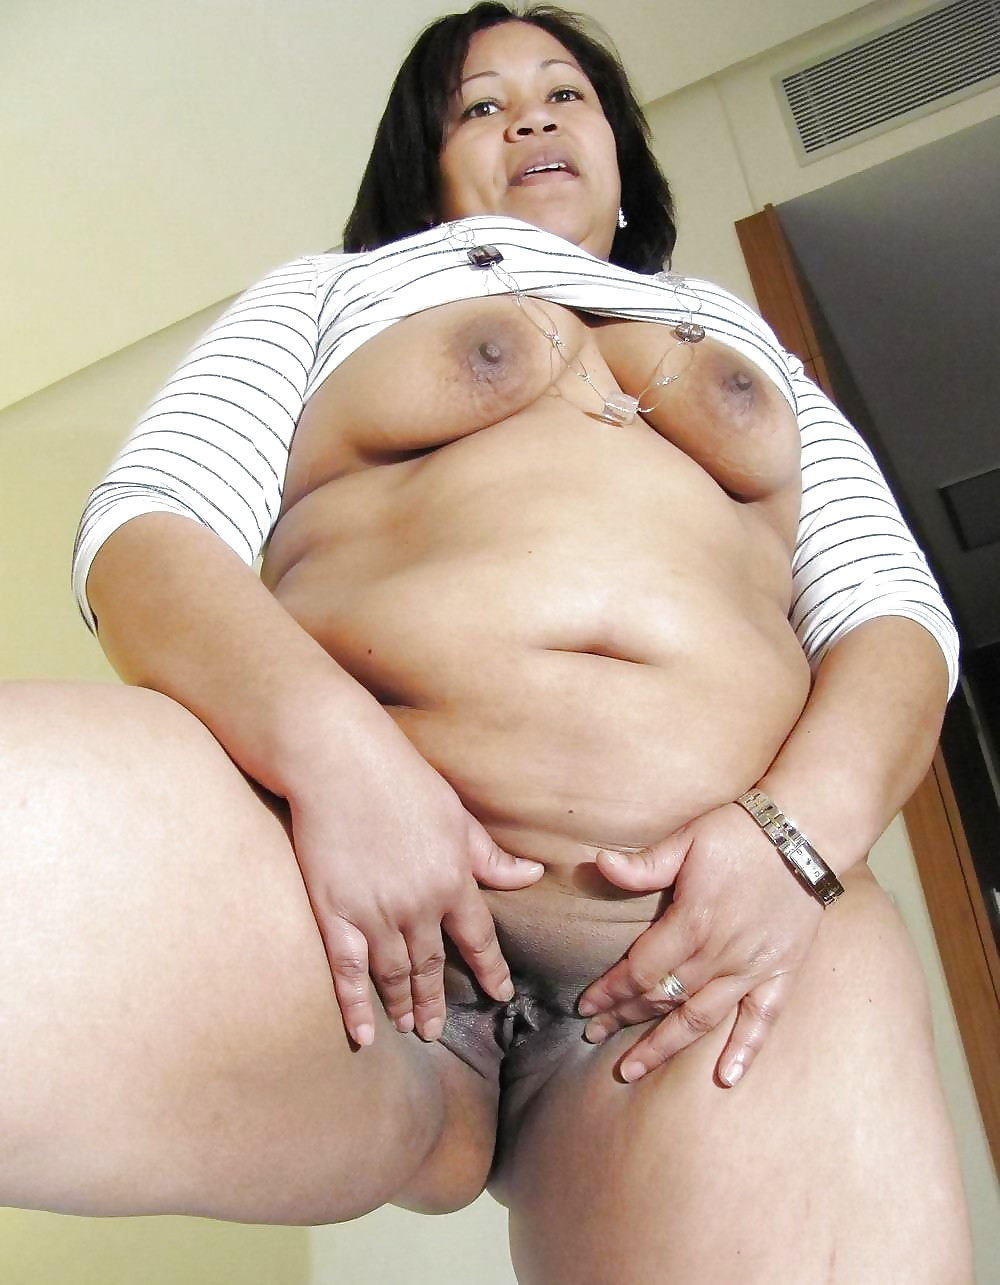 Free asian granny porn galleries